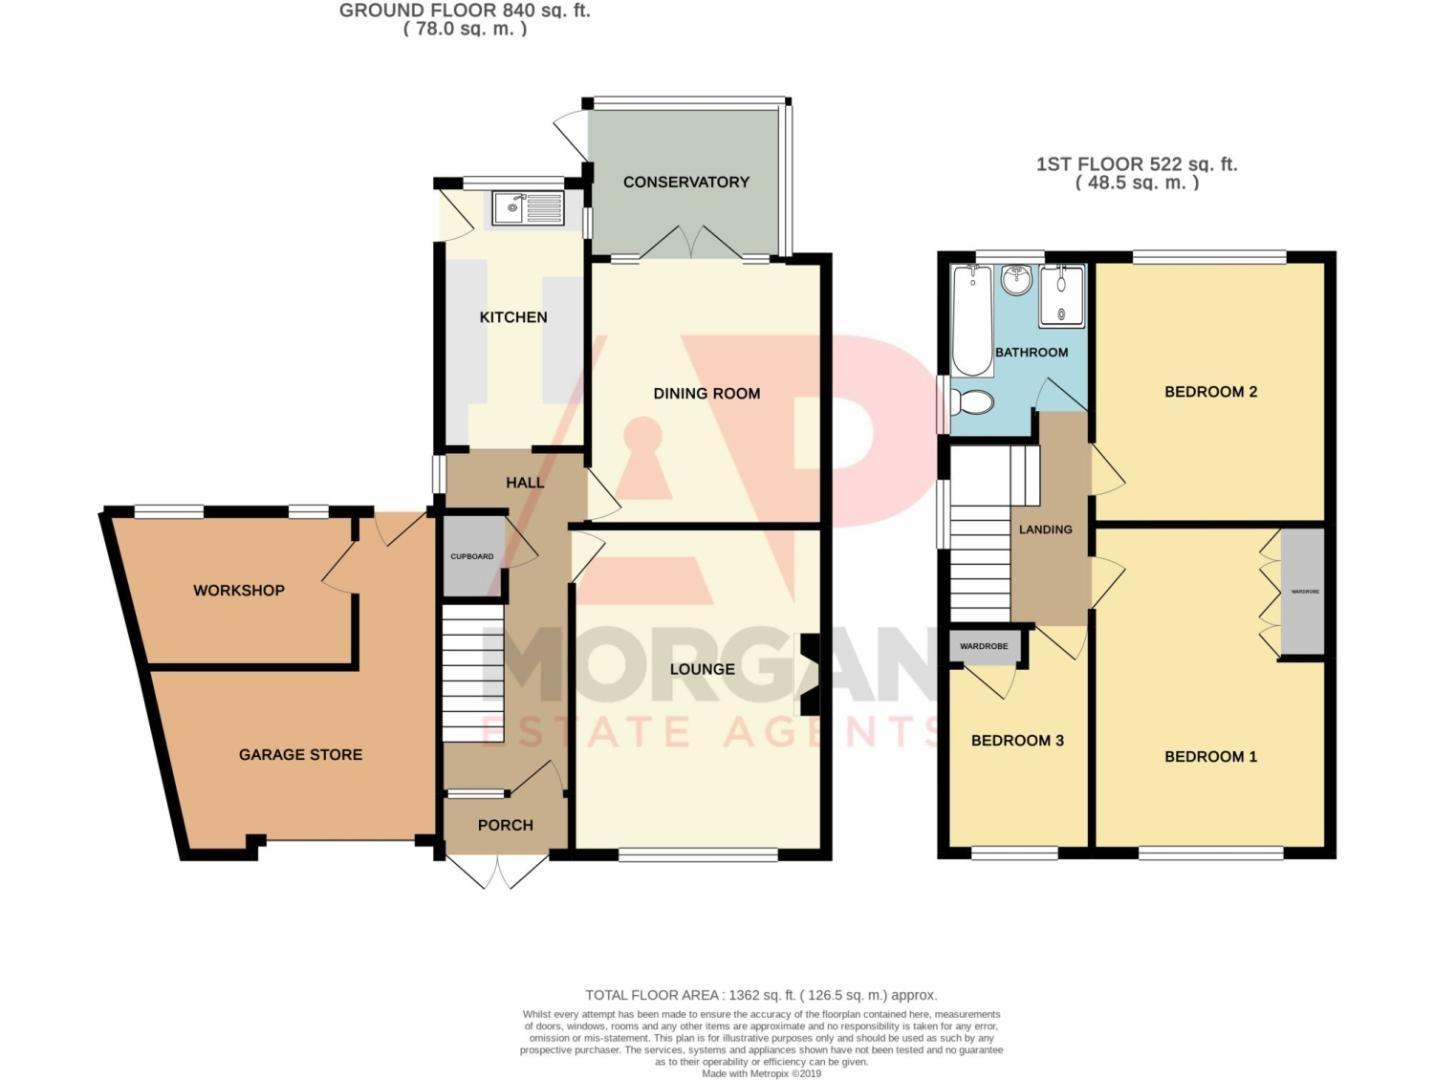 3 bed semi-detached for sale in Vicarage Crescent, Redditch - Property Floorplan